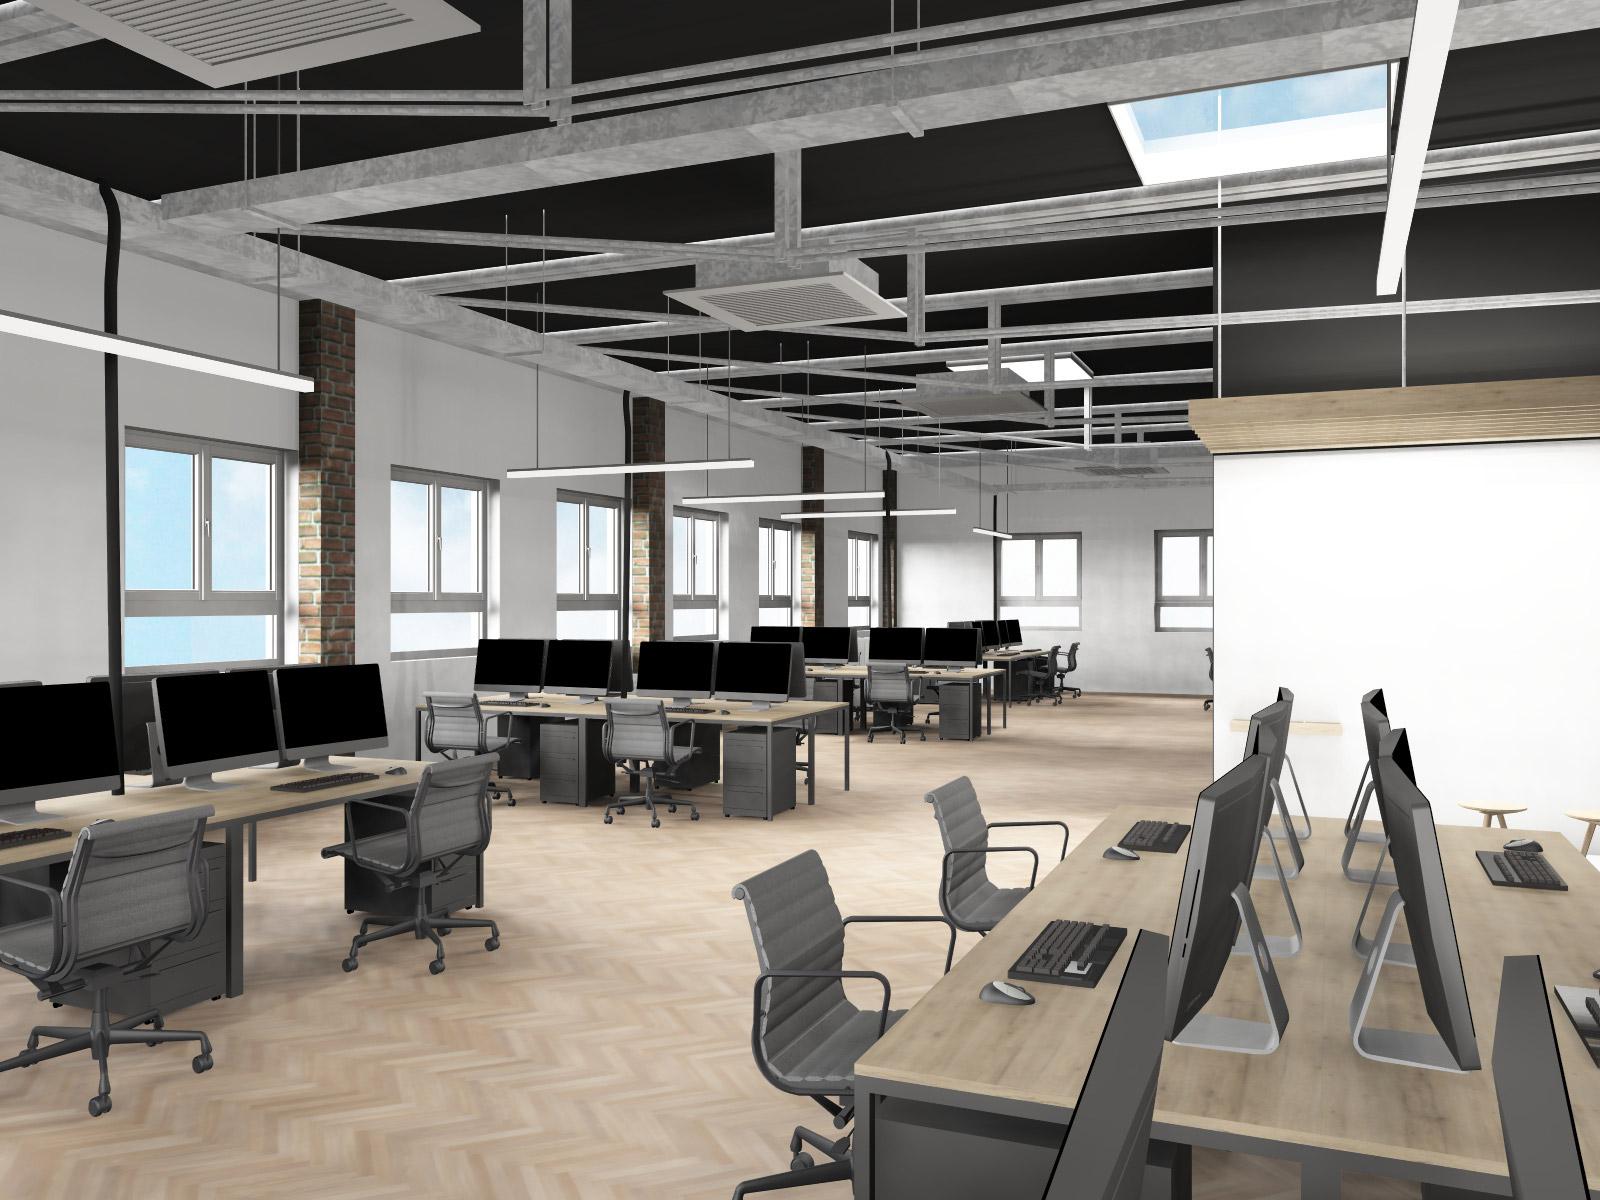 Büro-industrial look-office